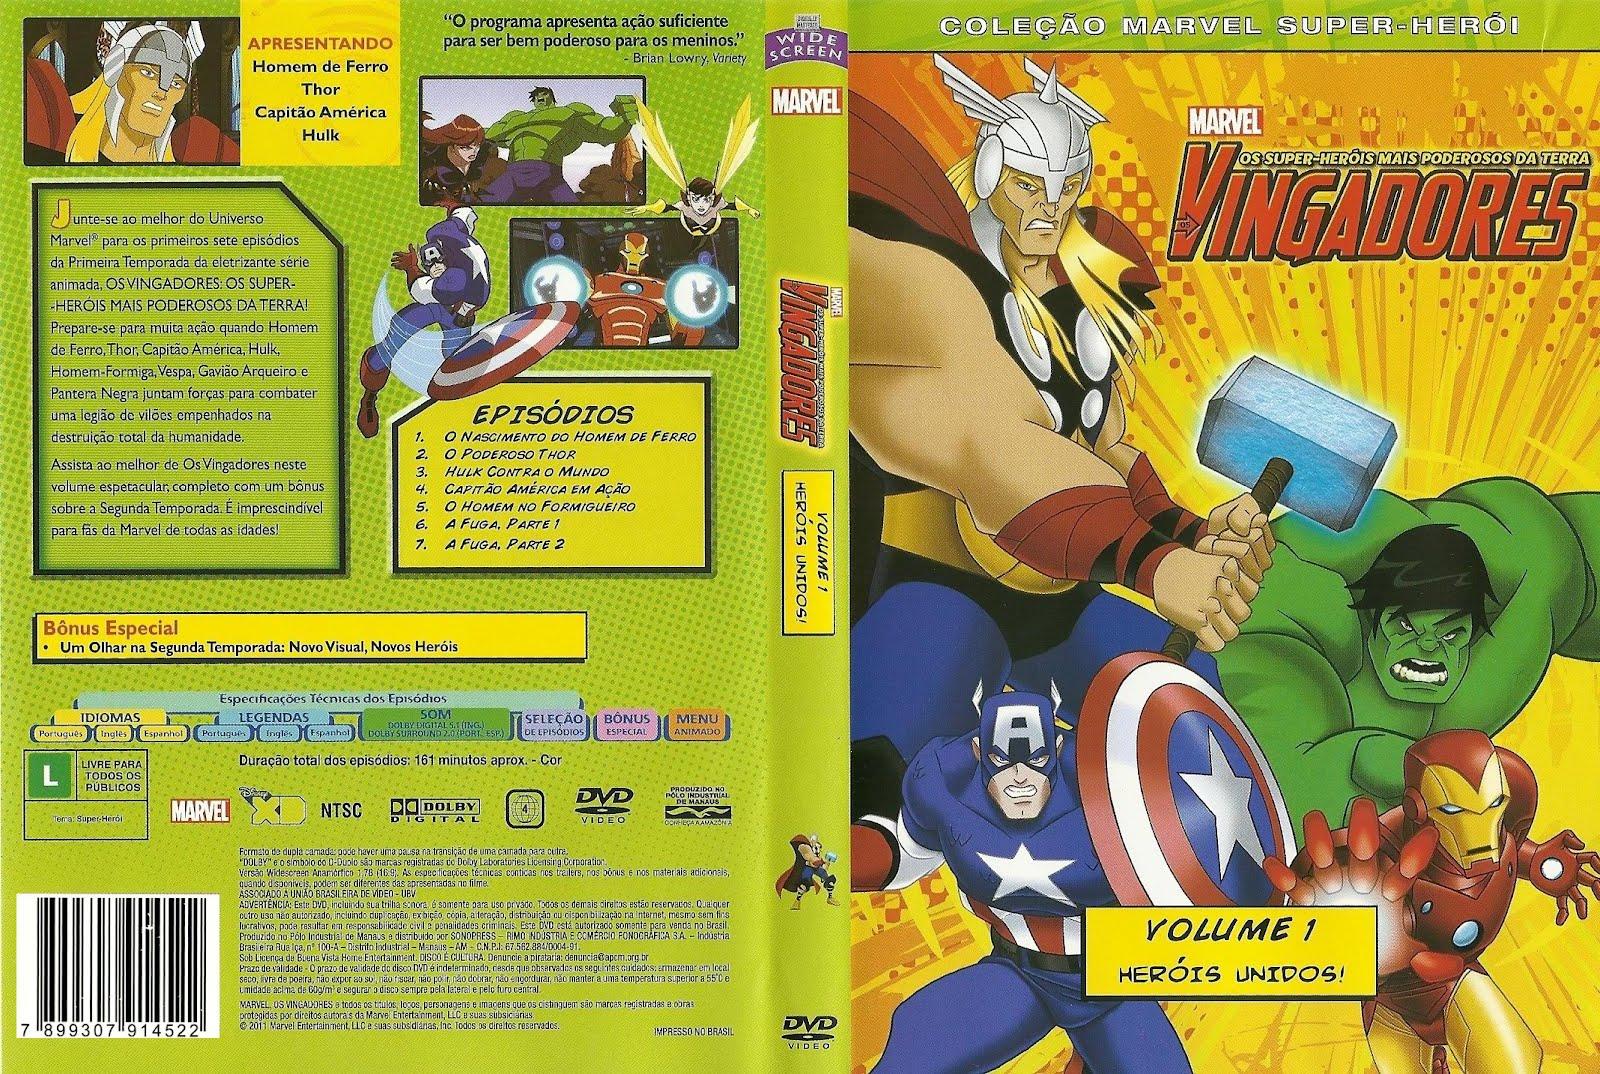 Os Vingadores Heróis Unidos Vol. 1 DVDRip RMVB Dublado Vingadores 2B  2BHer 25C3 25B3is 2BUnidos 2BVol